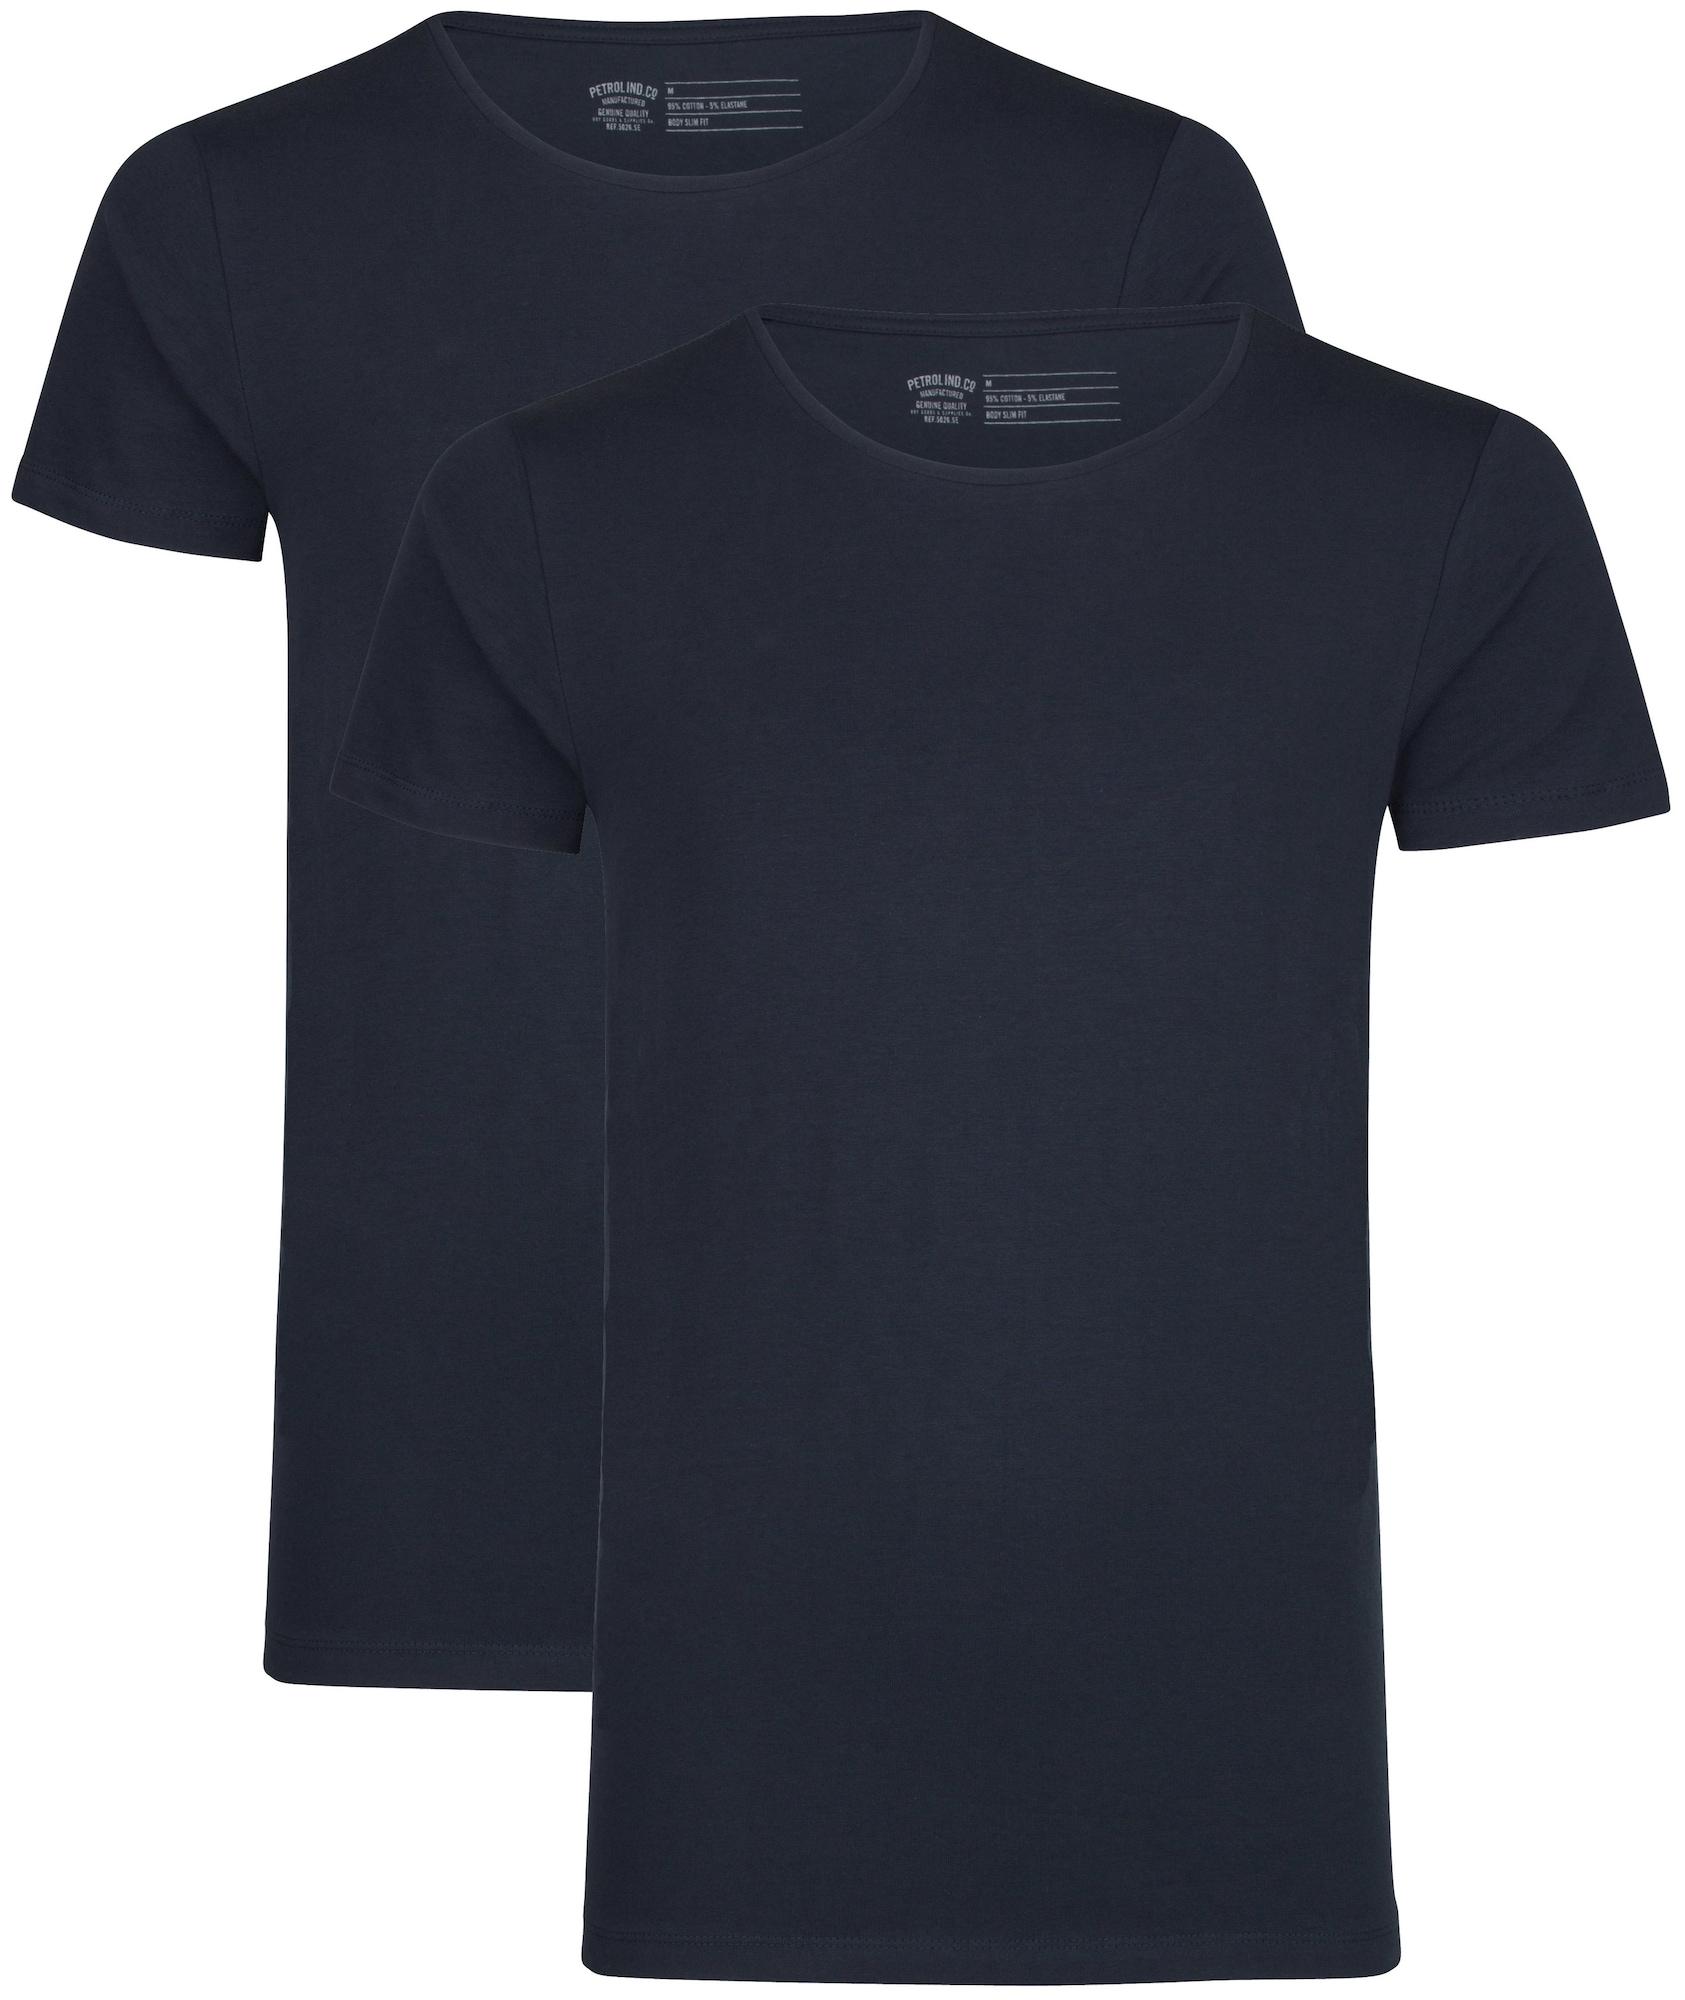 Petrol Industries Marškinėliai nakties mėlyna